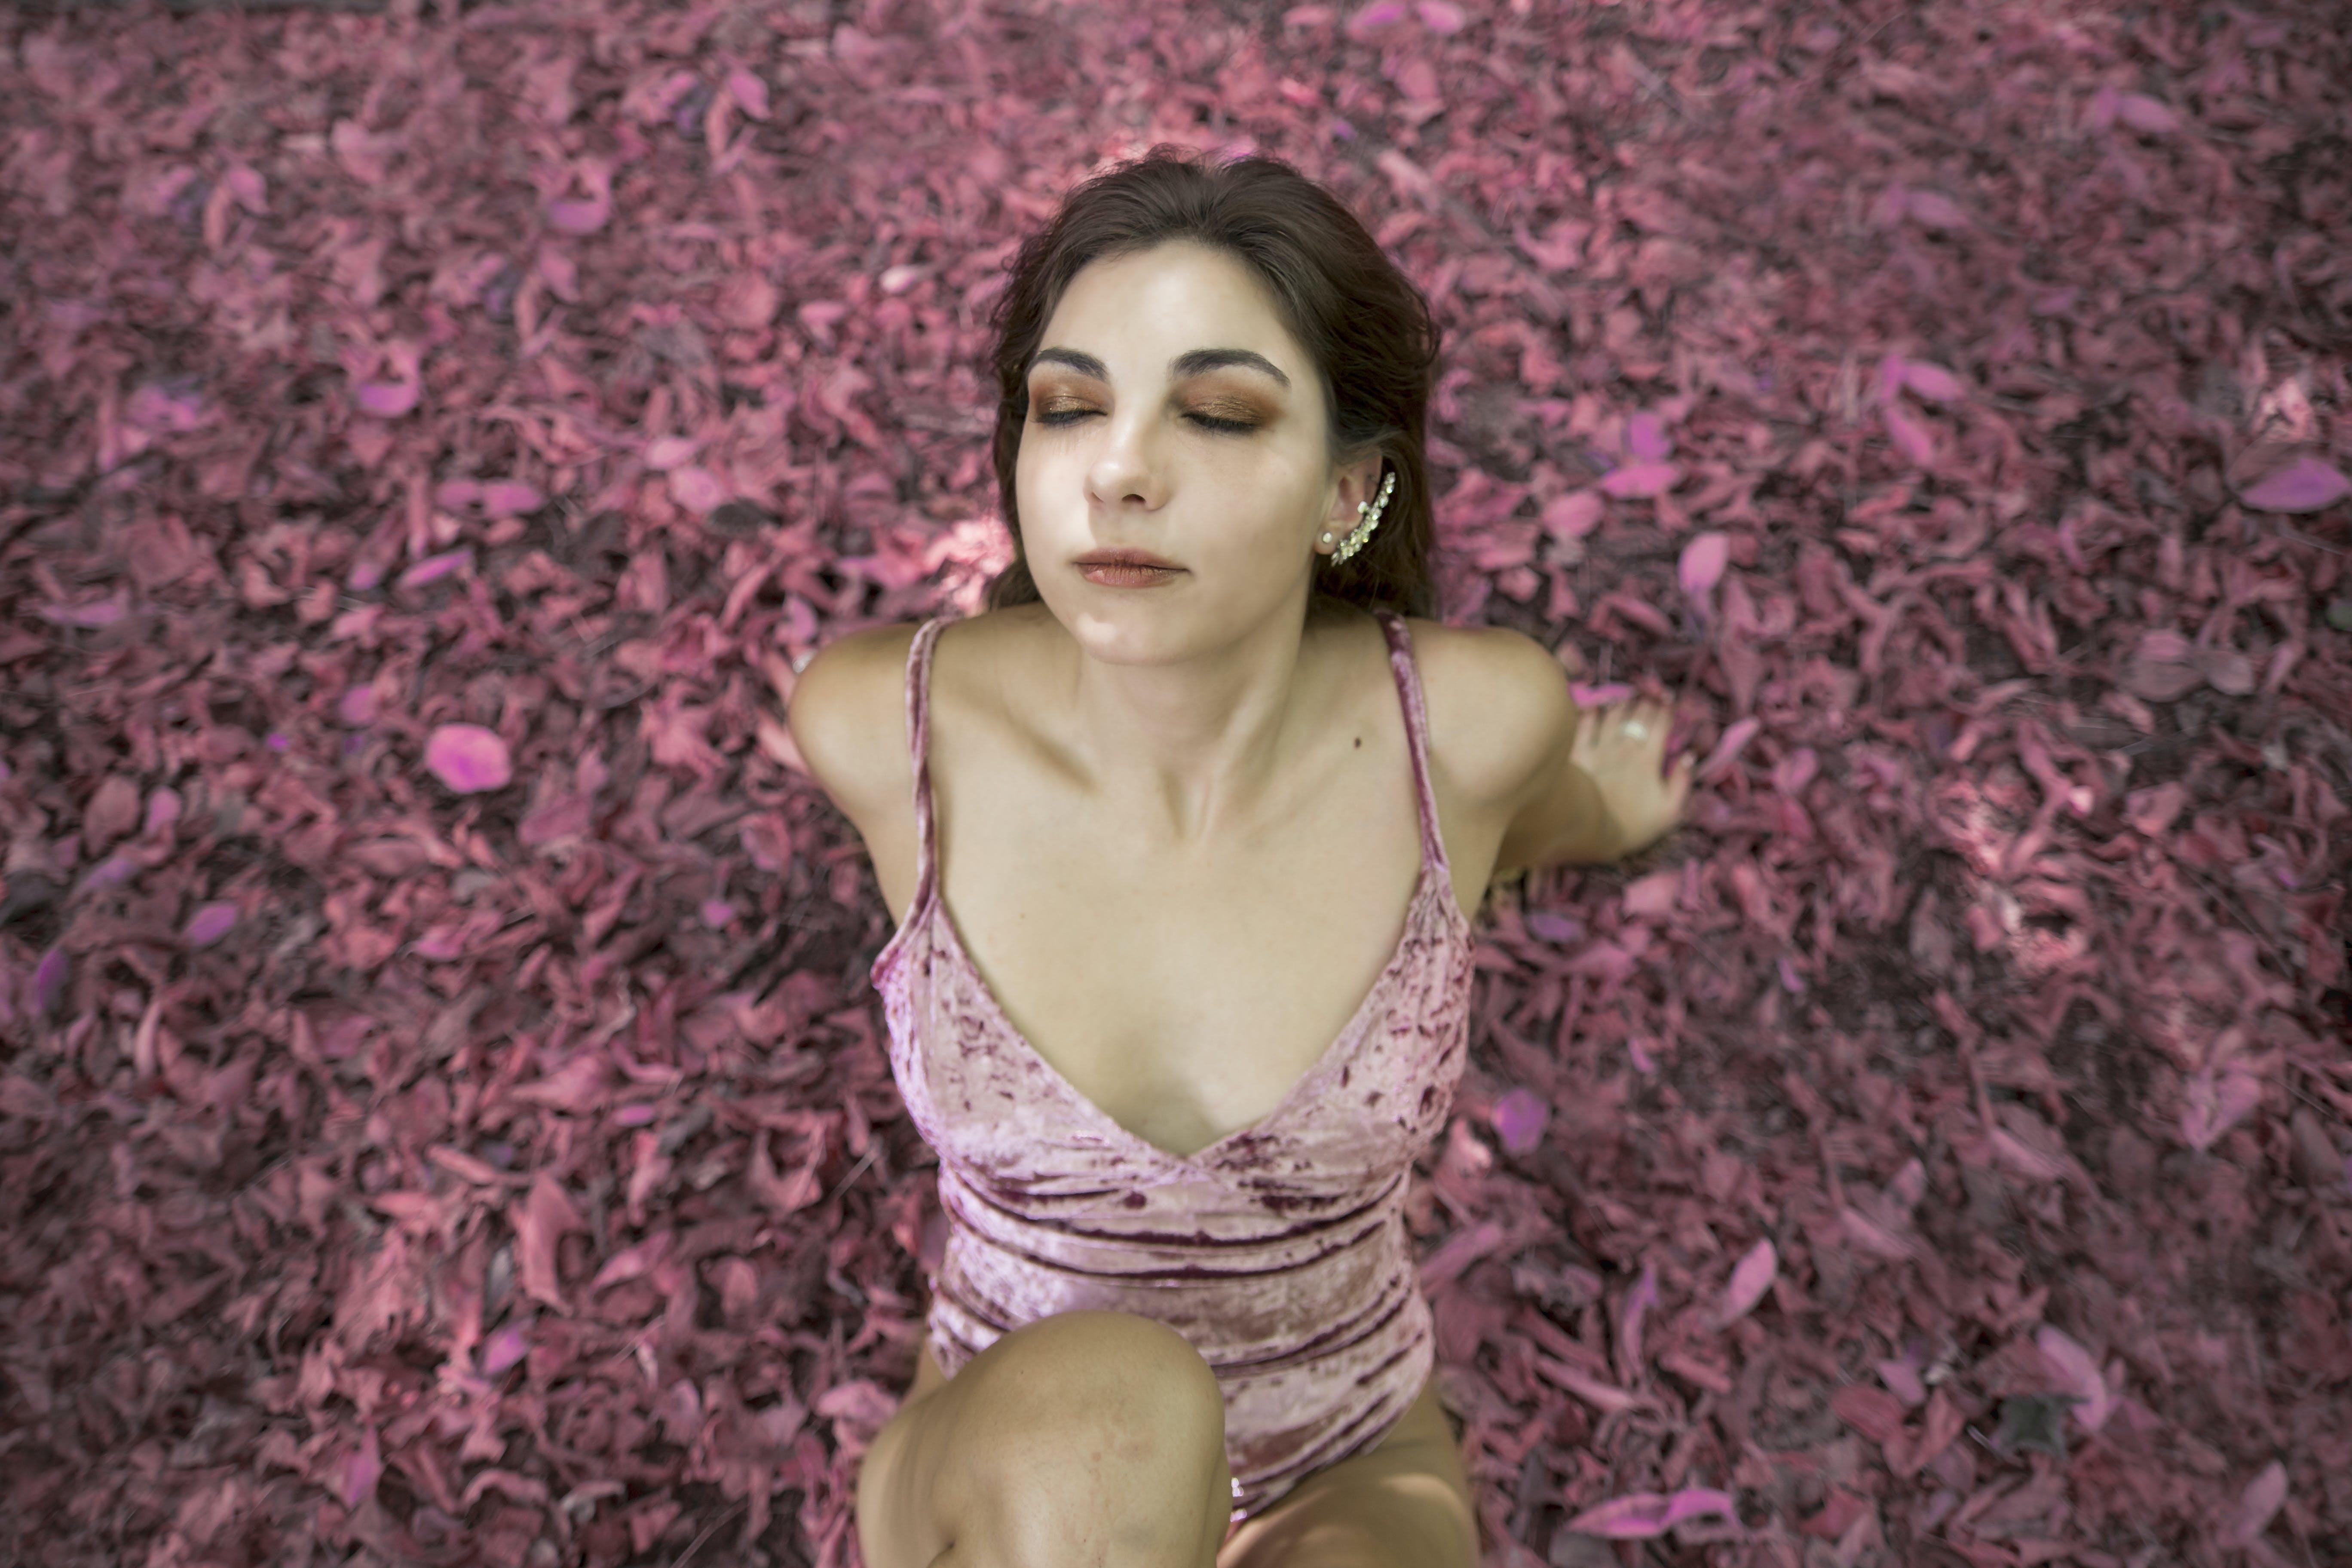 Woman in Pink Swimwear